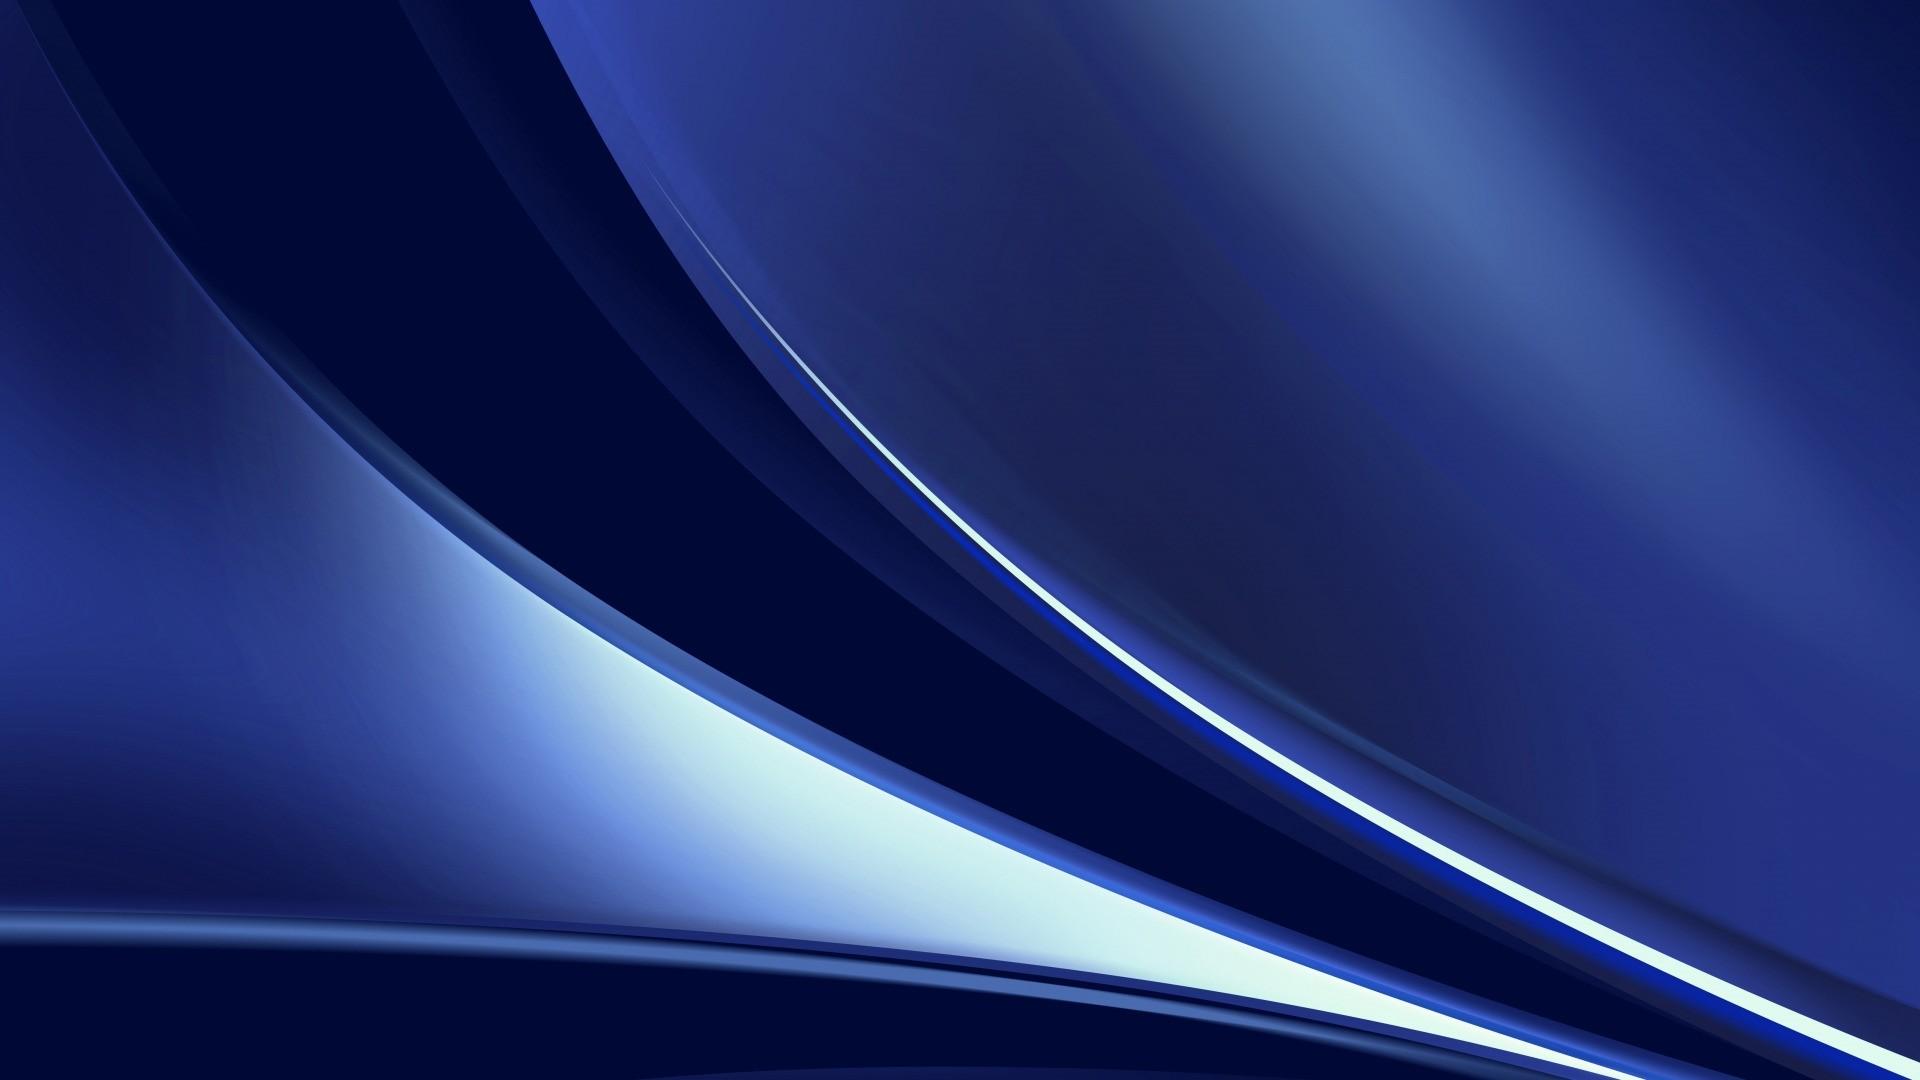 Spark Blue HD Wallpaper